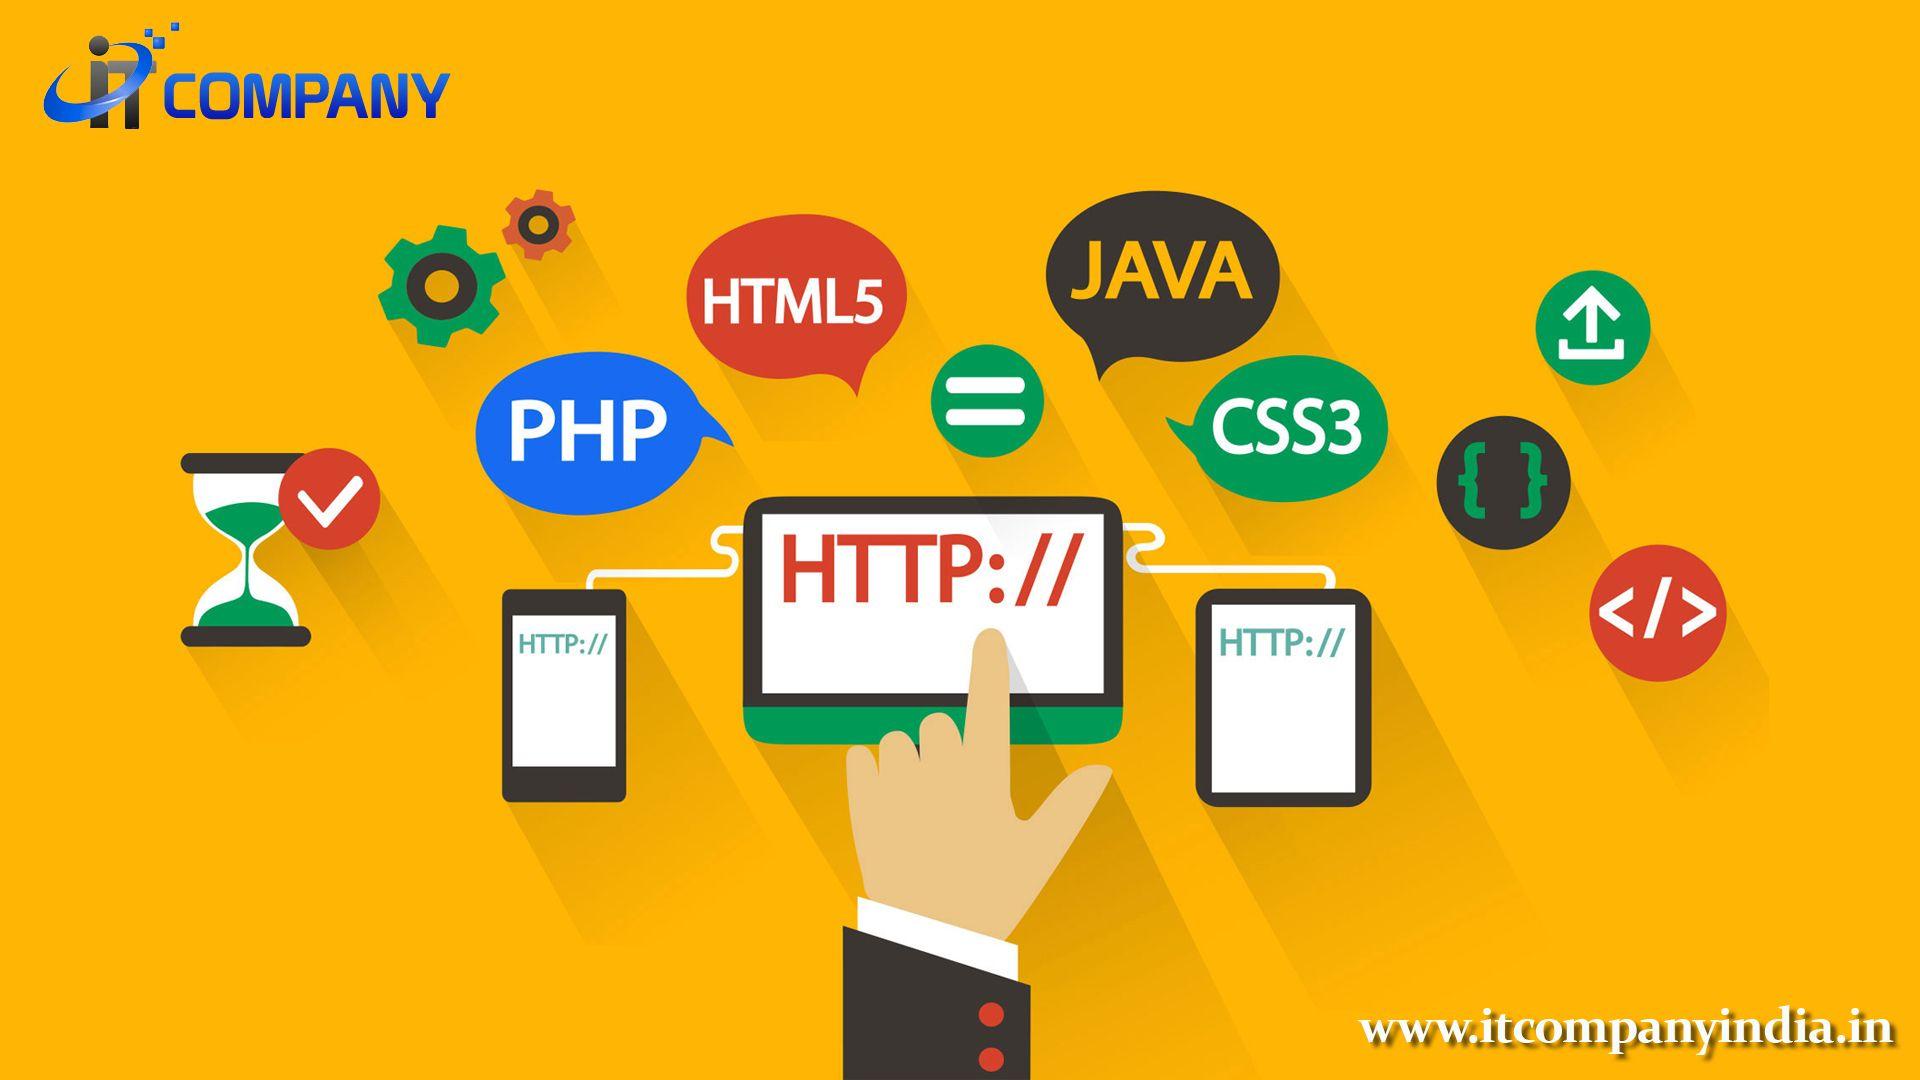 It company india is a professional web development